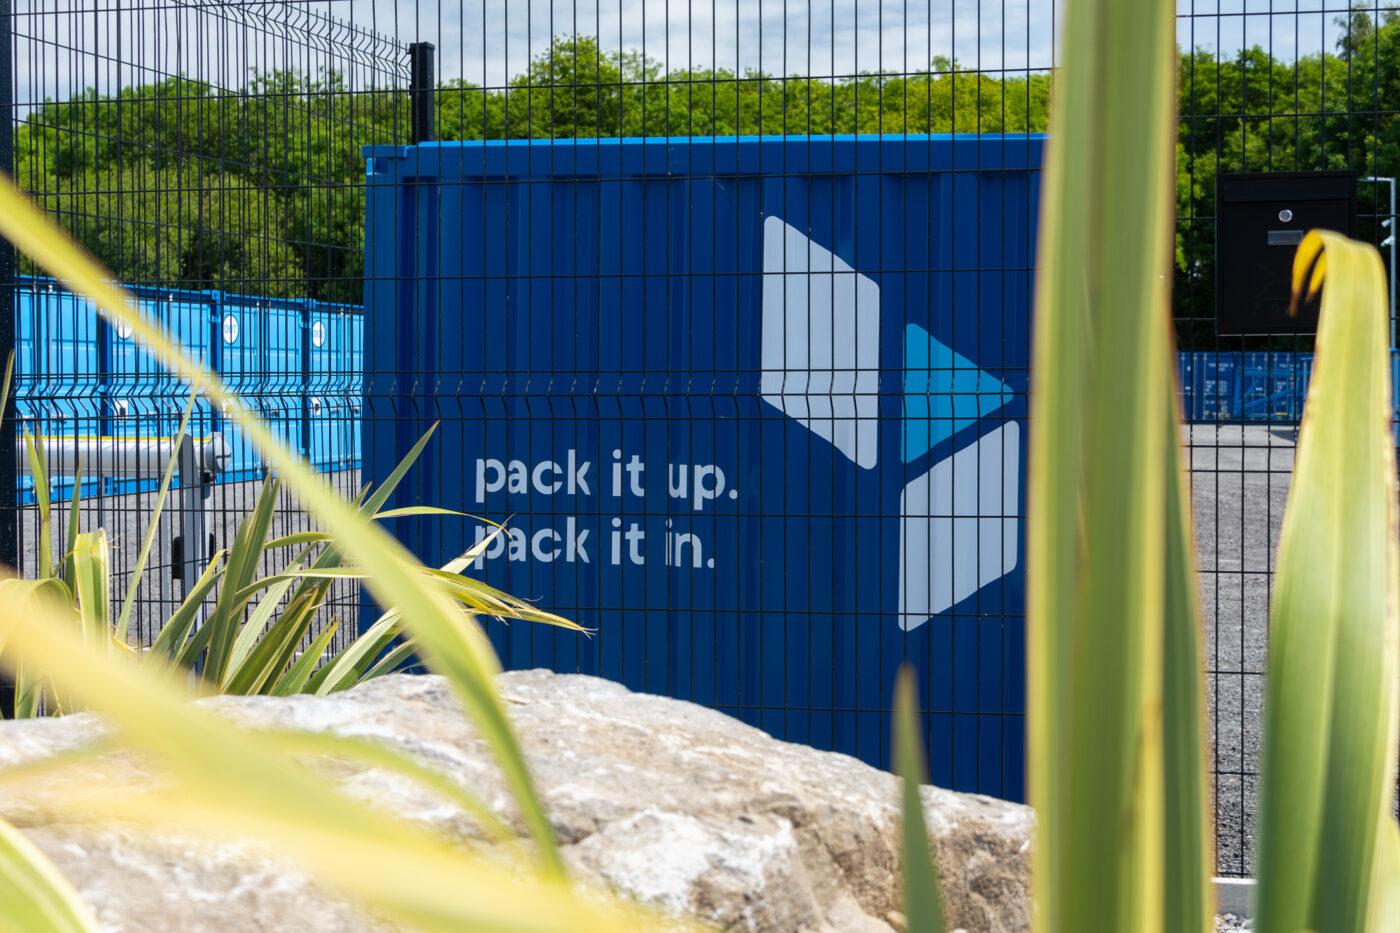 blue self storage facility updates - Cardiff and Tyneside storage